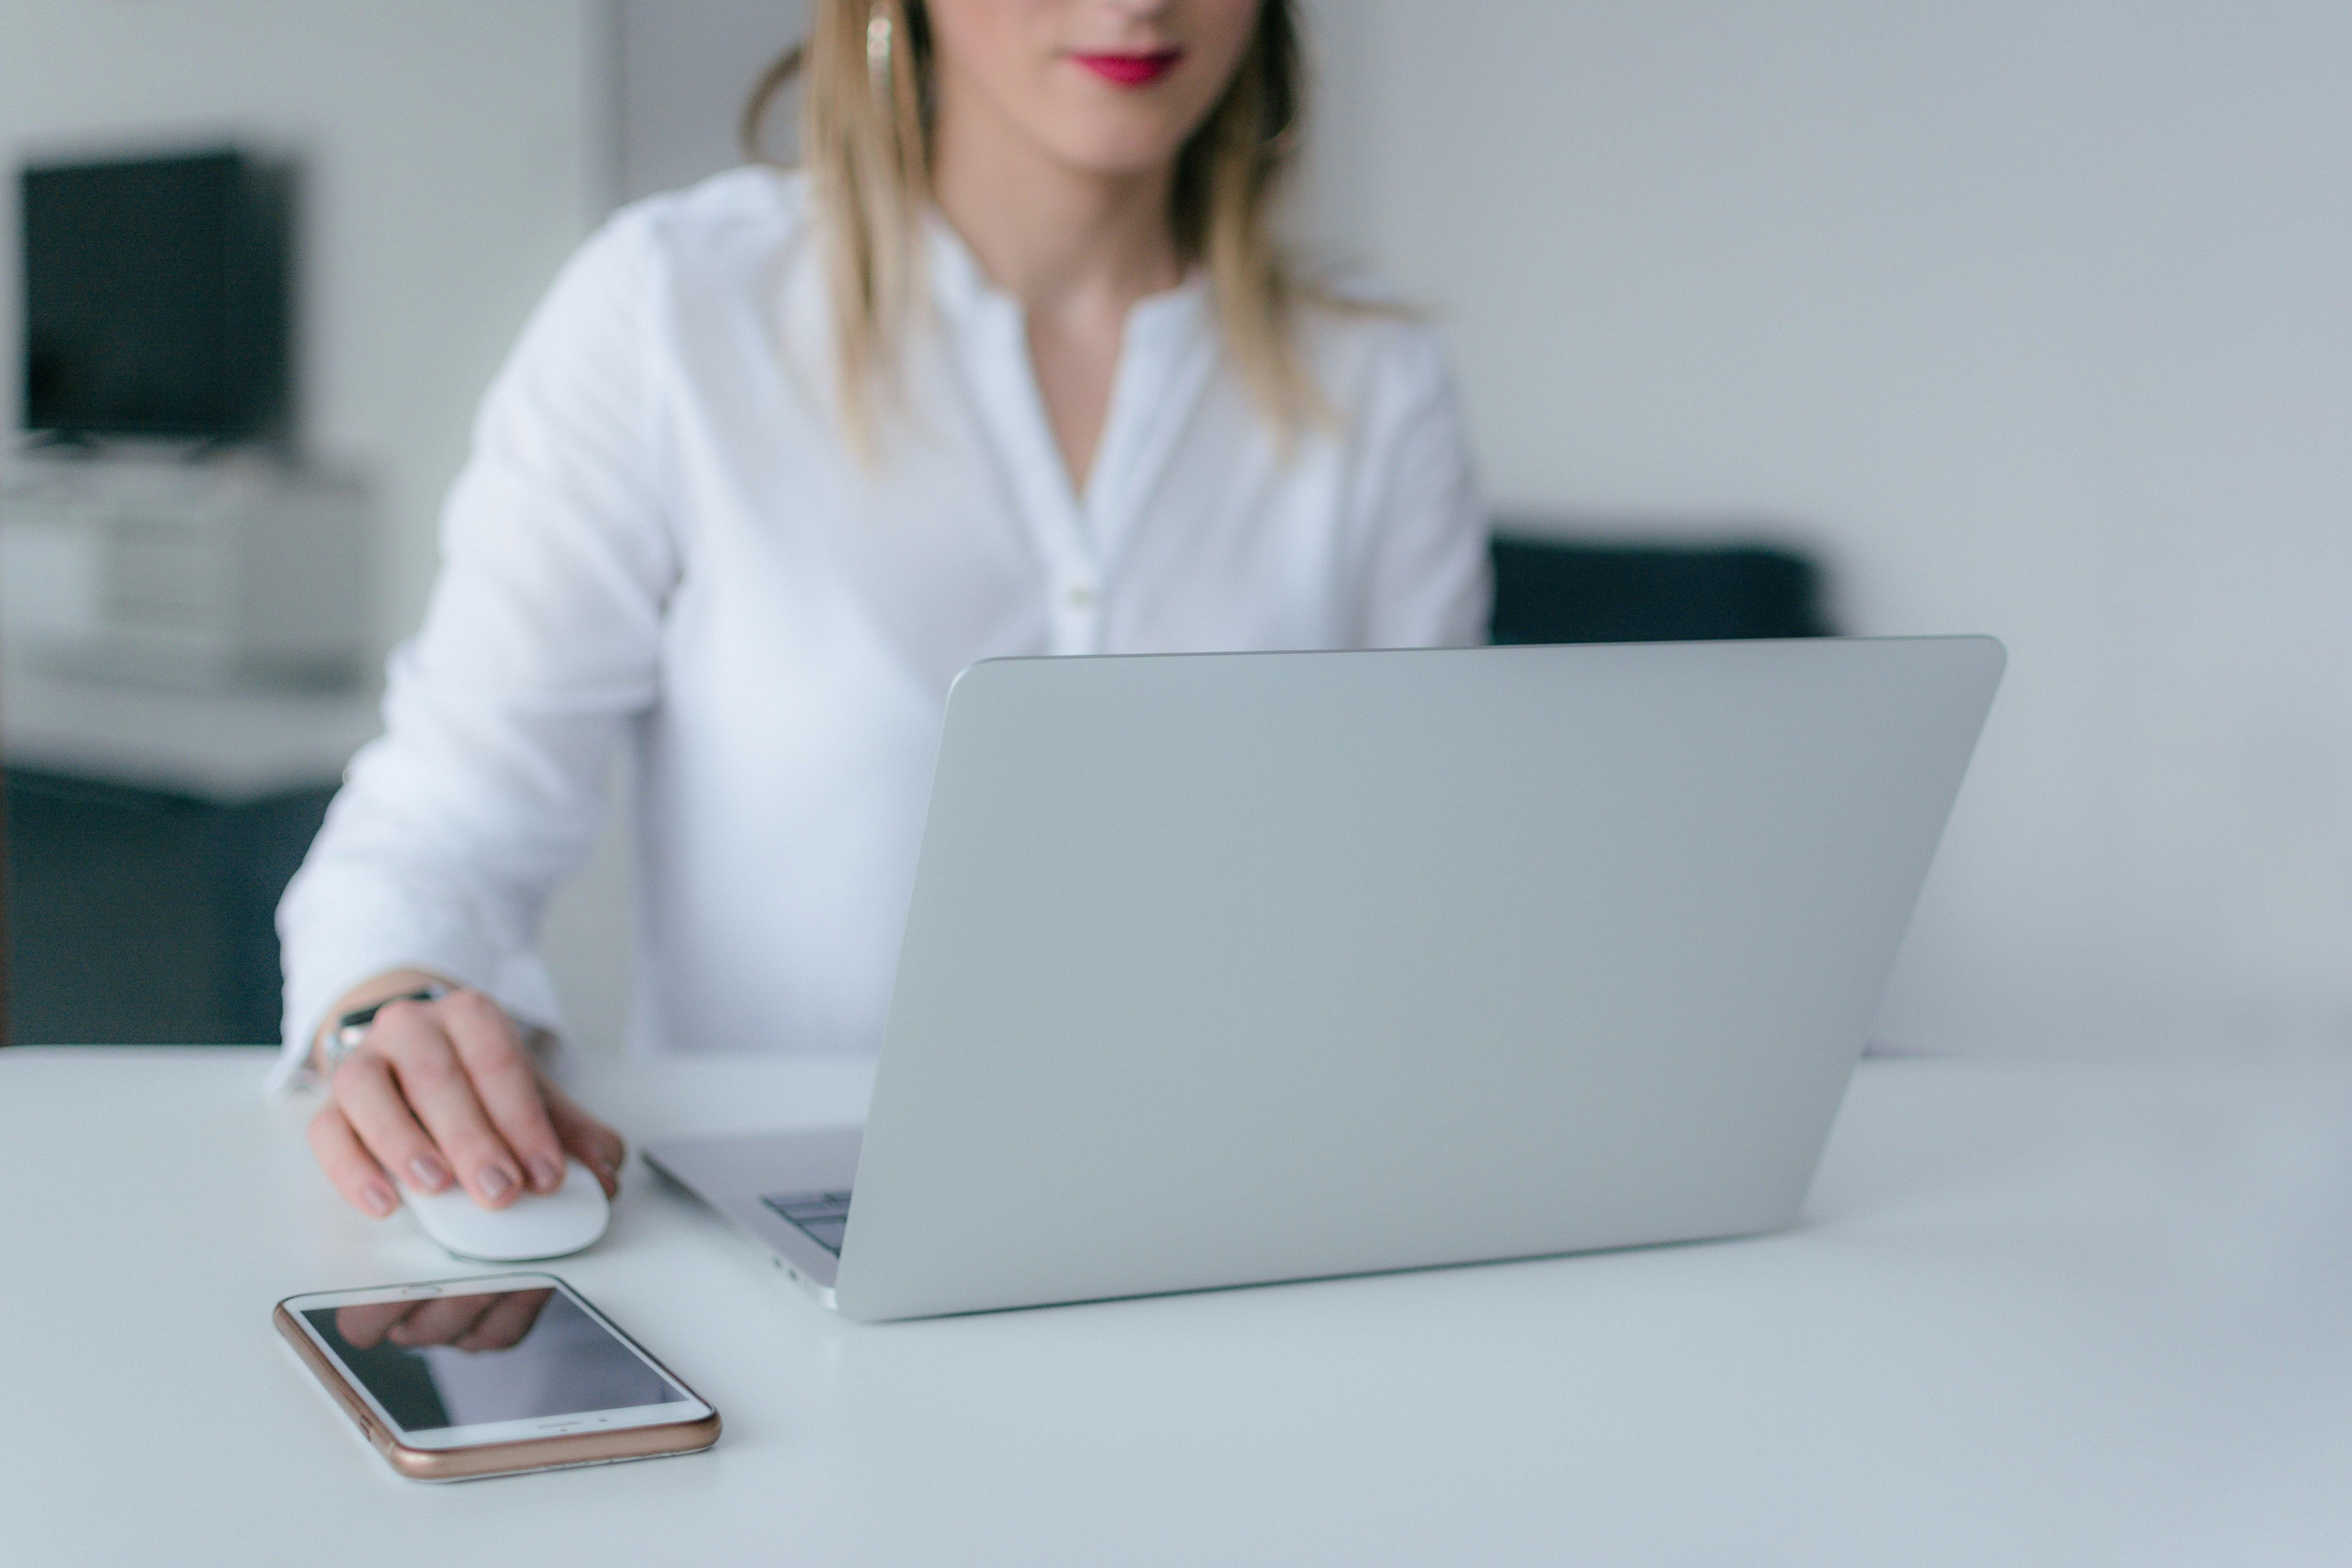 Mujer computadora soporte IT ingeniera infromática programadora